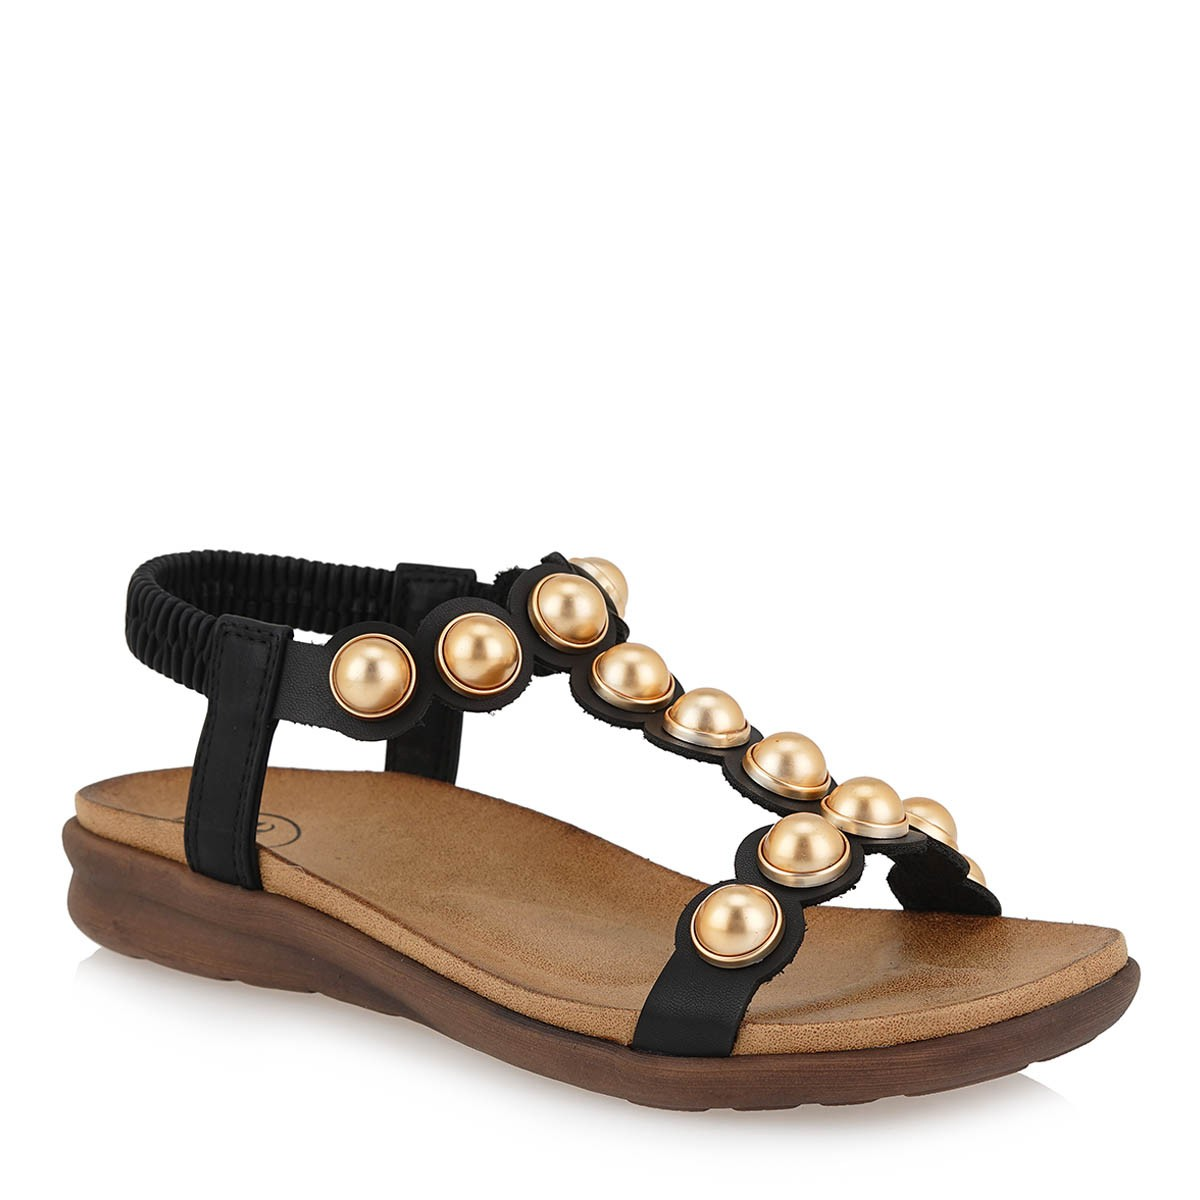 EXE Shoes Γυναικεία Πέδιλα 874 Μαύρο I489Q8742001